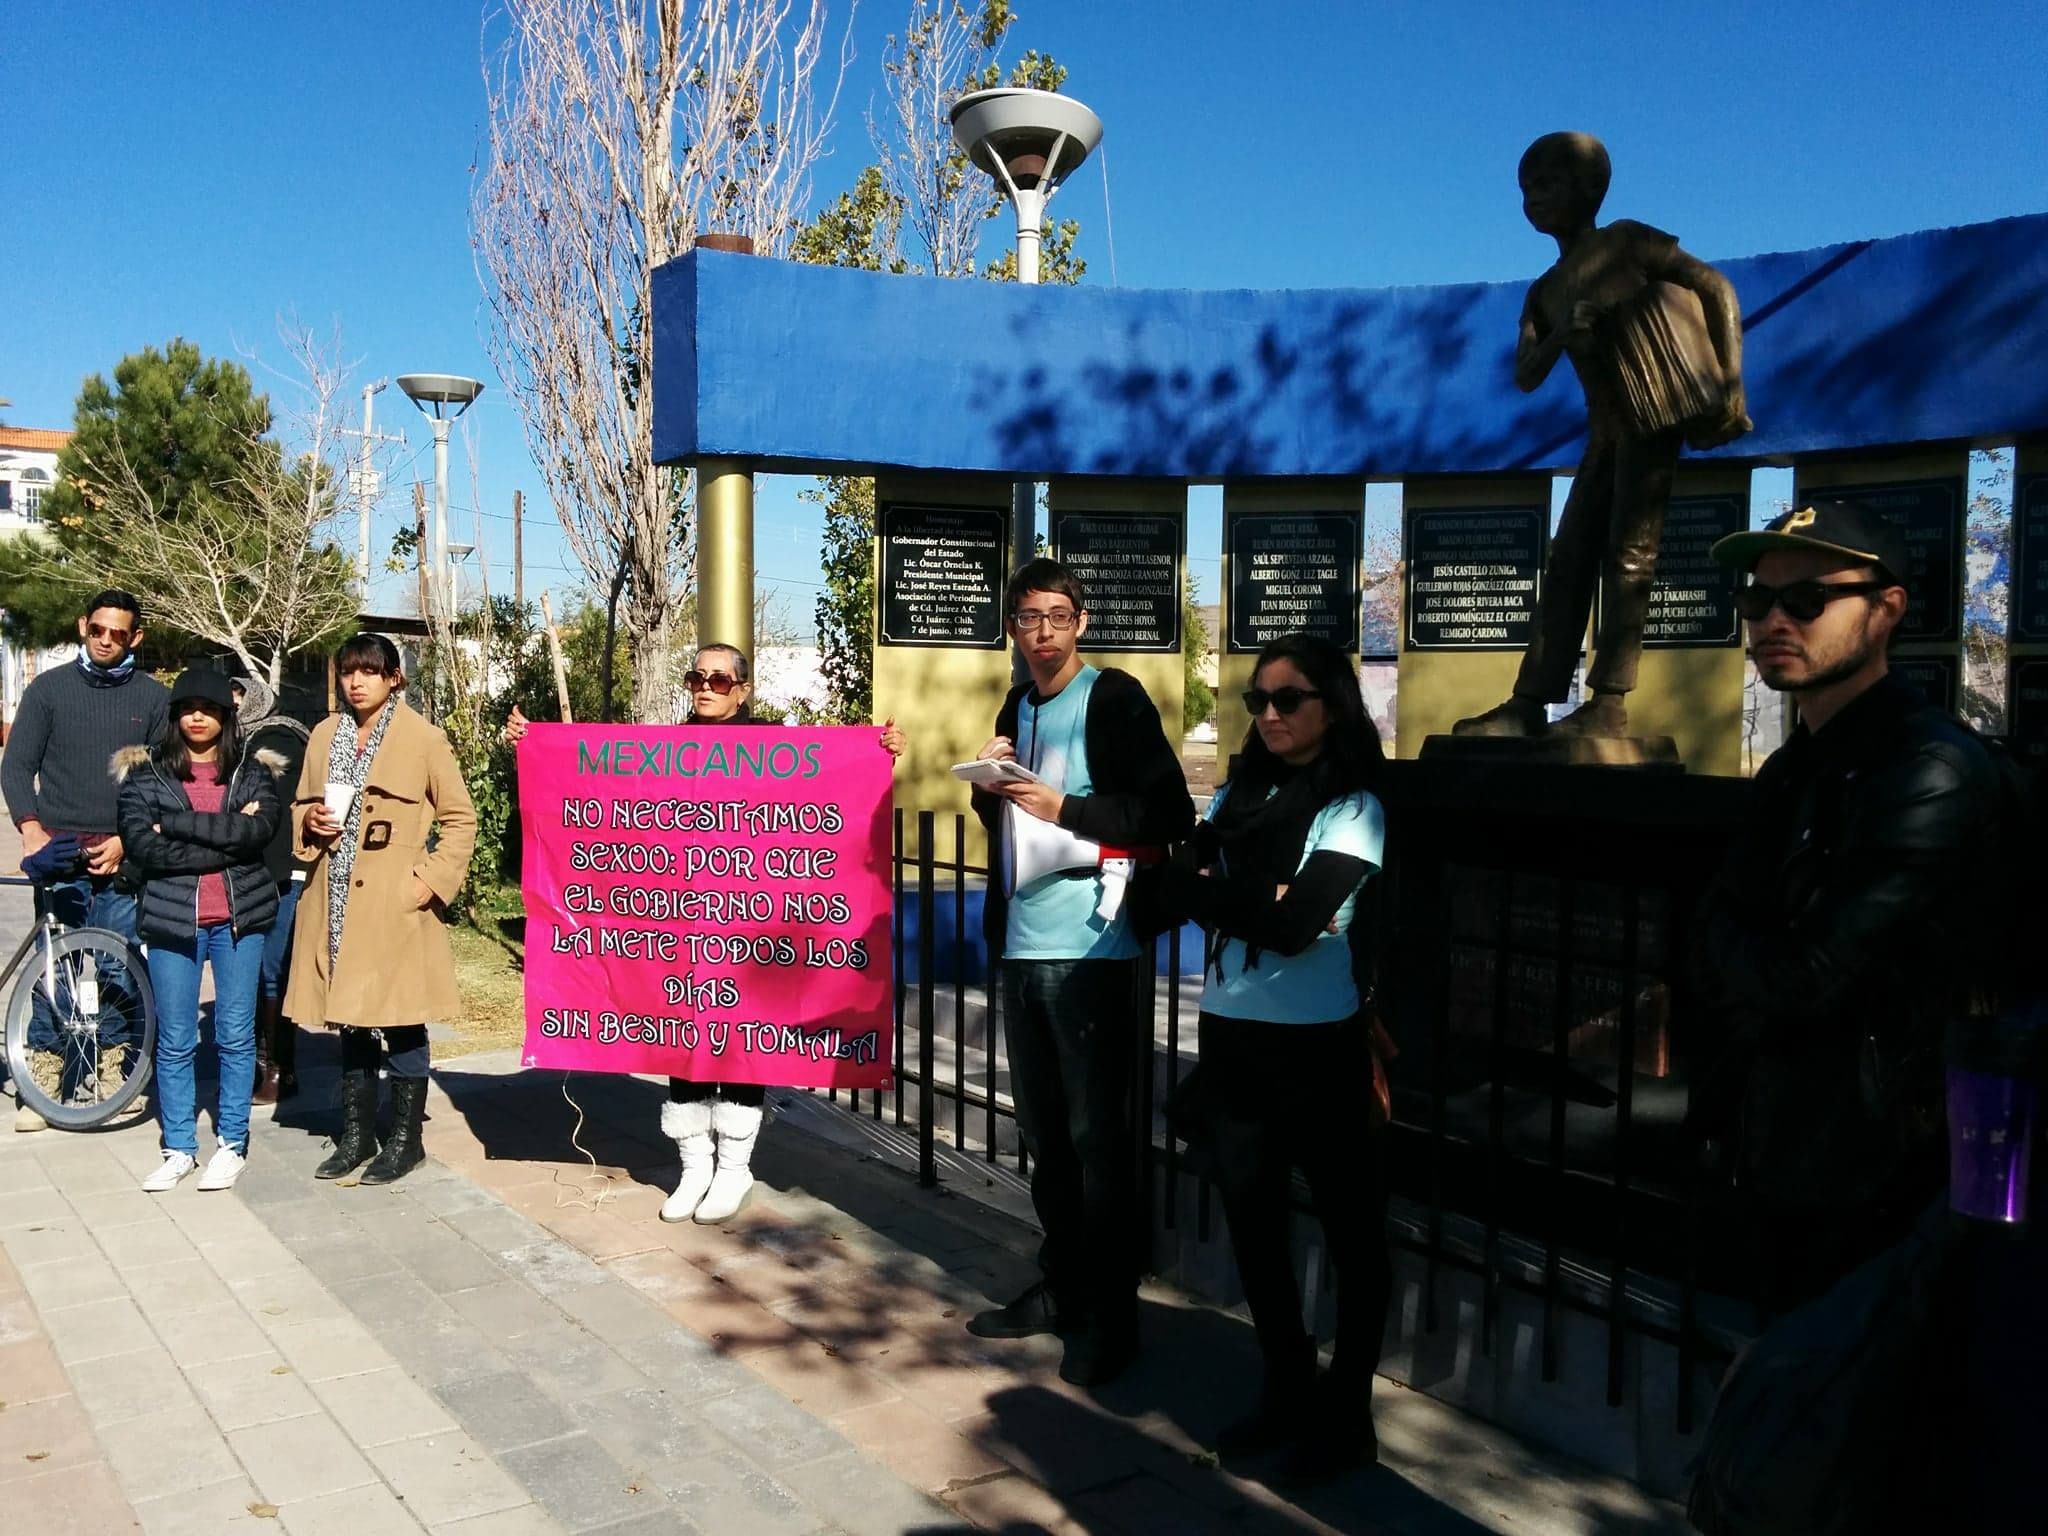 129 Antonio-protesta